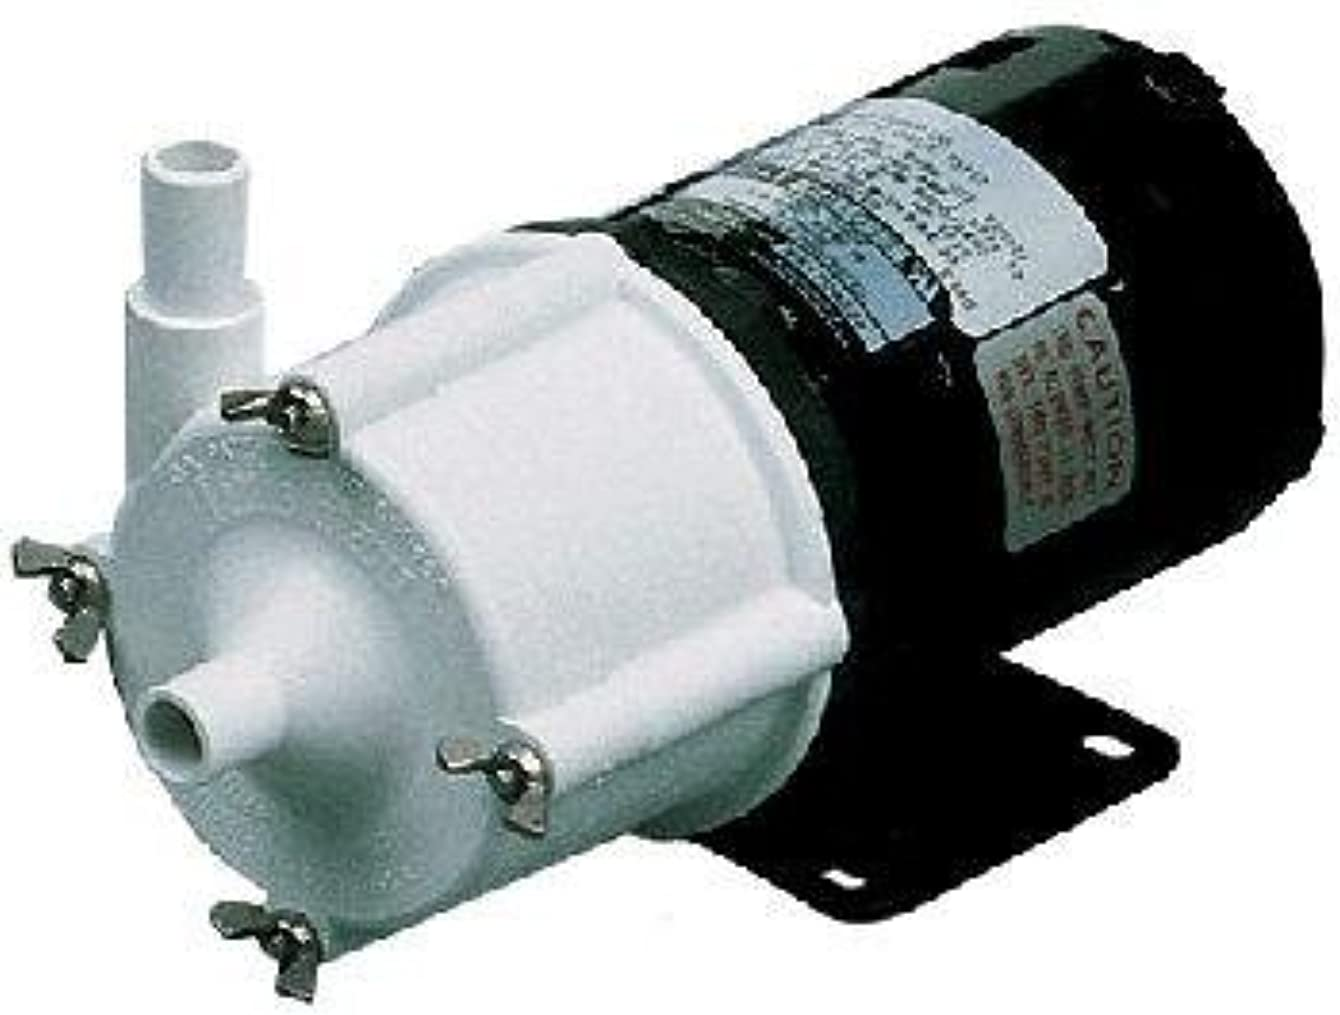 Little Giant 3-MDX 456 GPH - Magnetic Drive Pump, 6' Power Cord (581031)